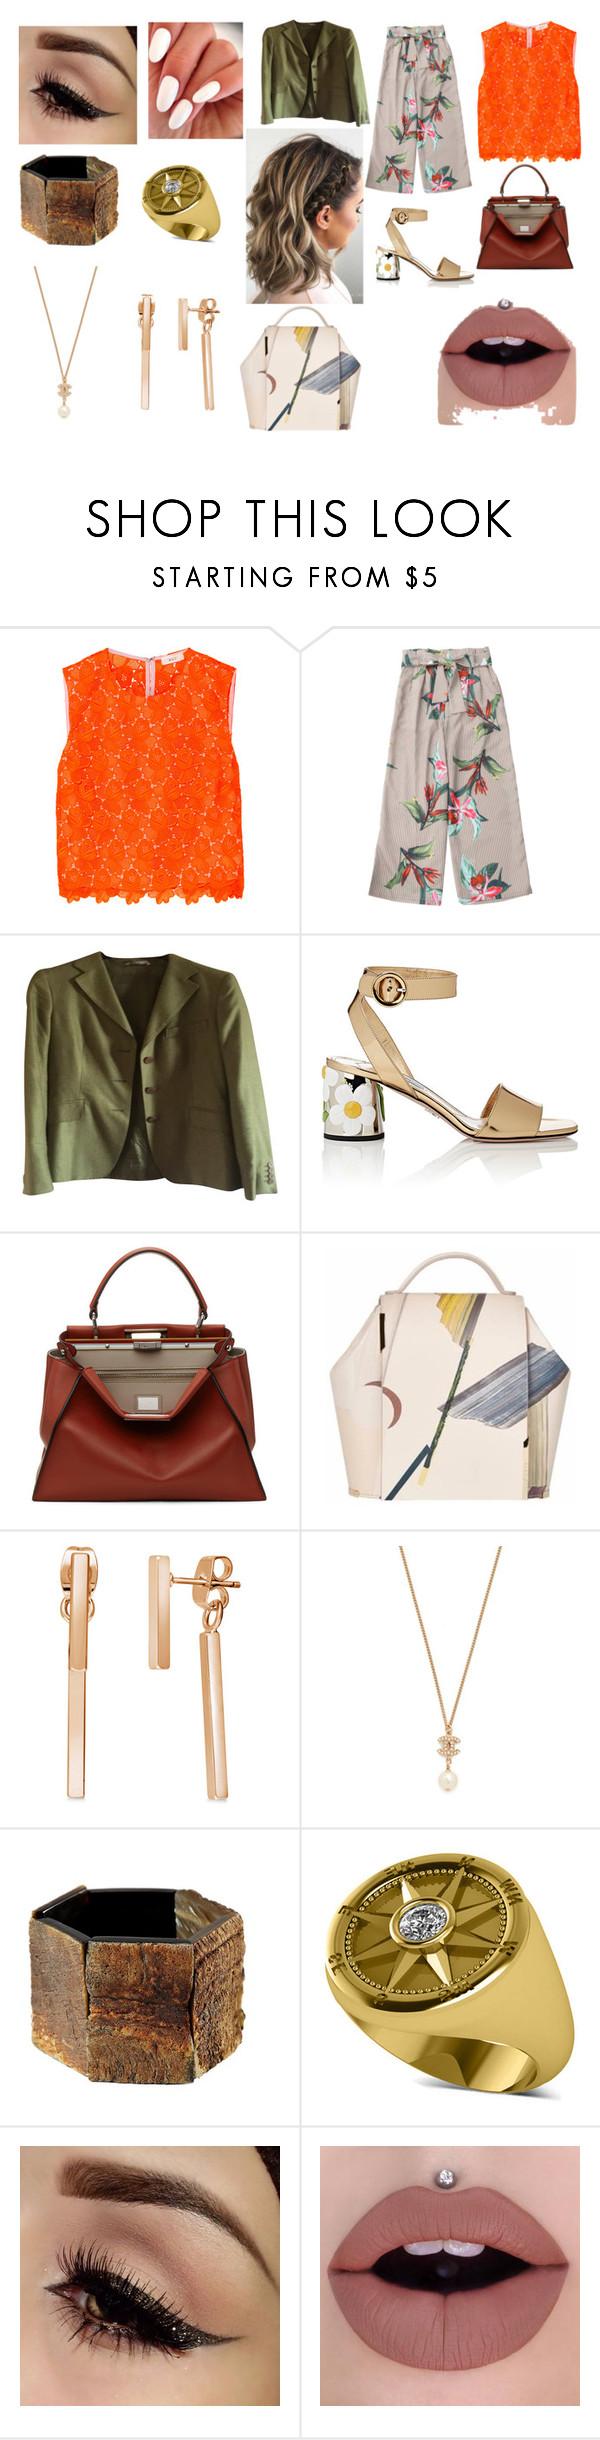 """Office trend"" by plozoya on Polyvore featuring moda, A.L.C., MaxMara, Prada, Fendi, Onesixone, BERRICLE y Allurez"